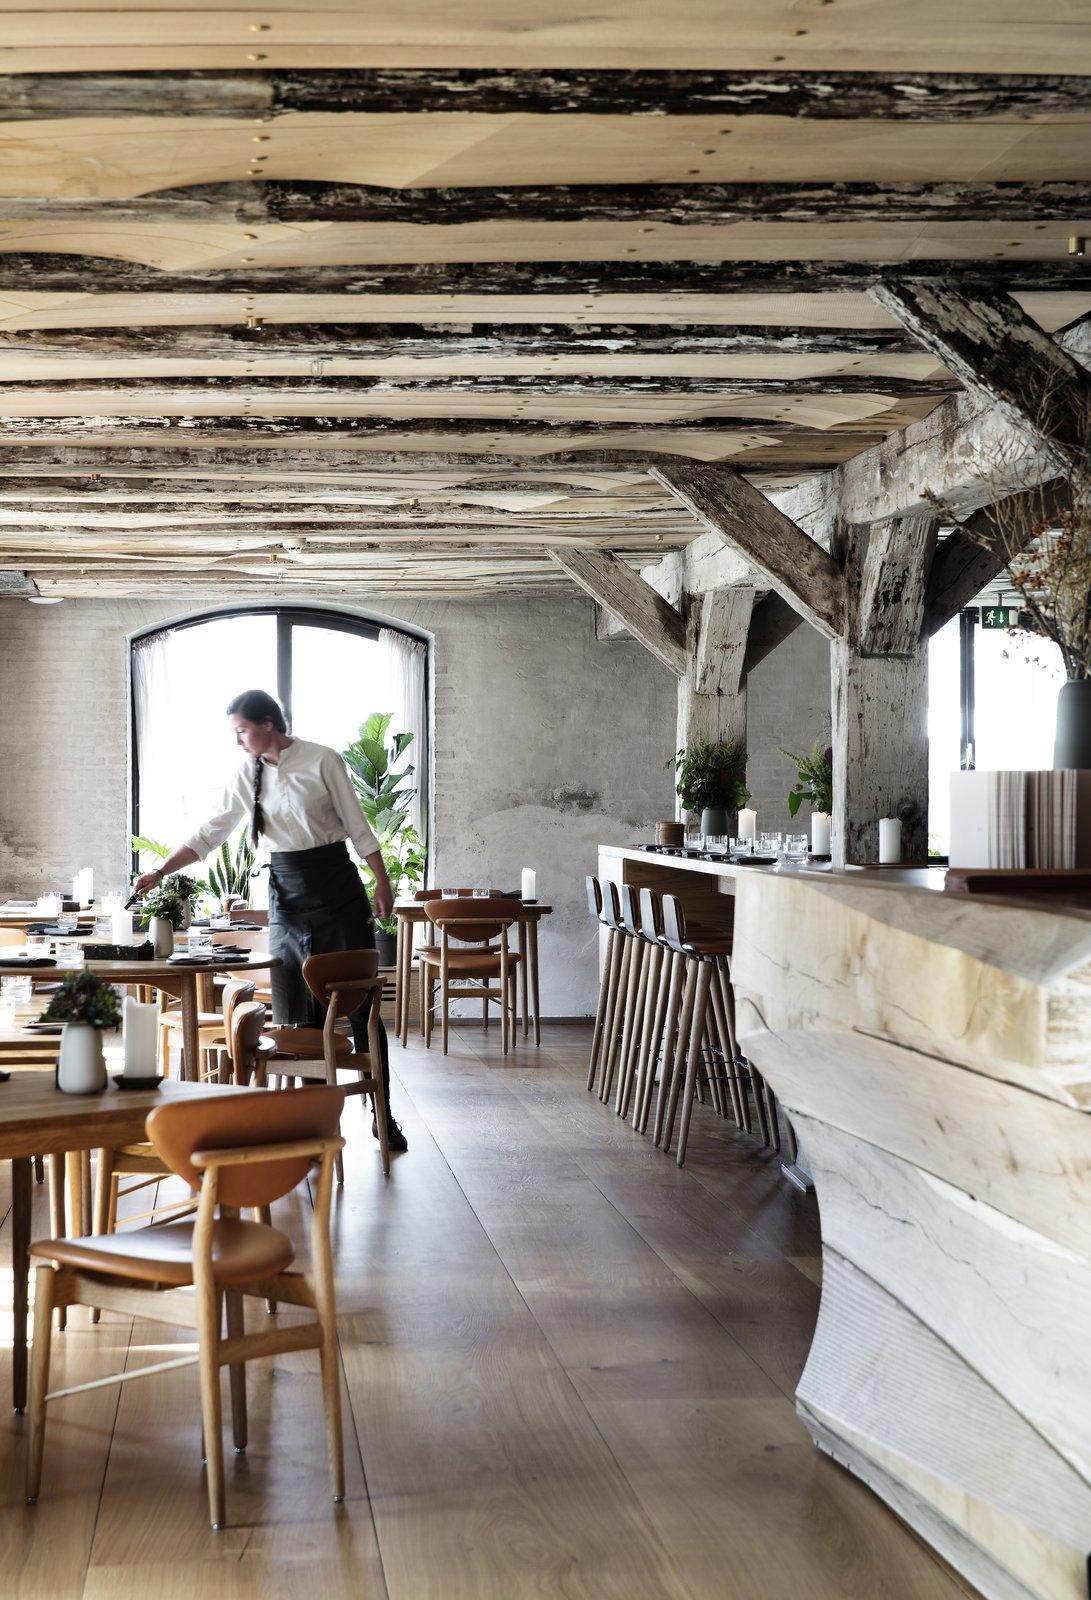 Snøhetta Designs the Interiors of Barr, the Noma Group's New  Copenhagen Restaurant - Photo 1 of 10